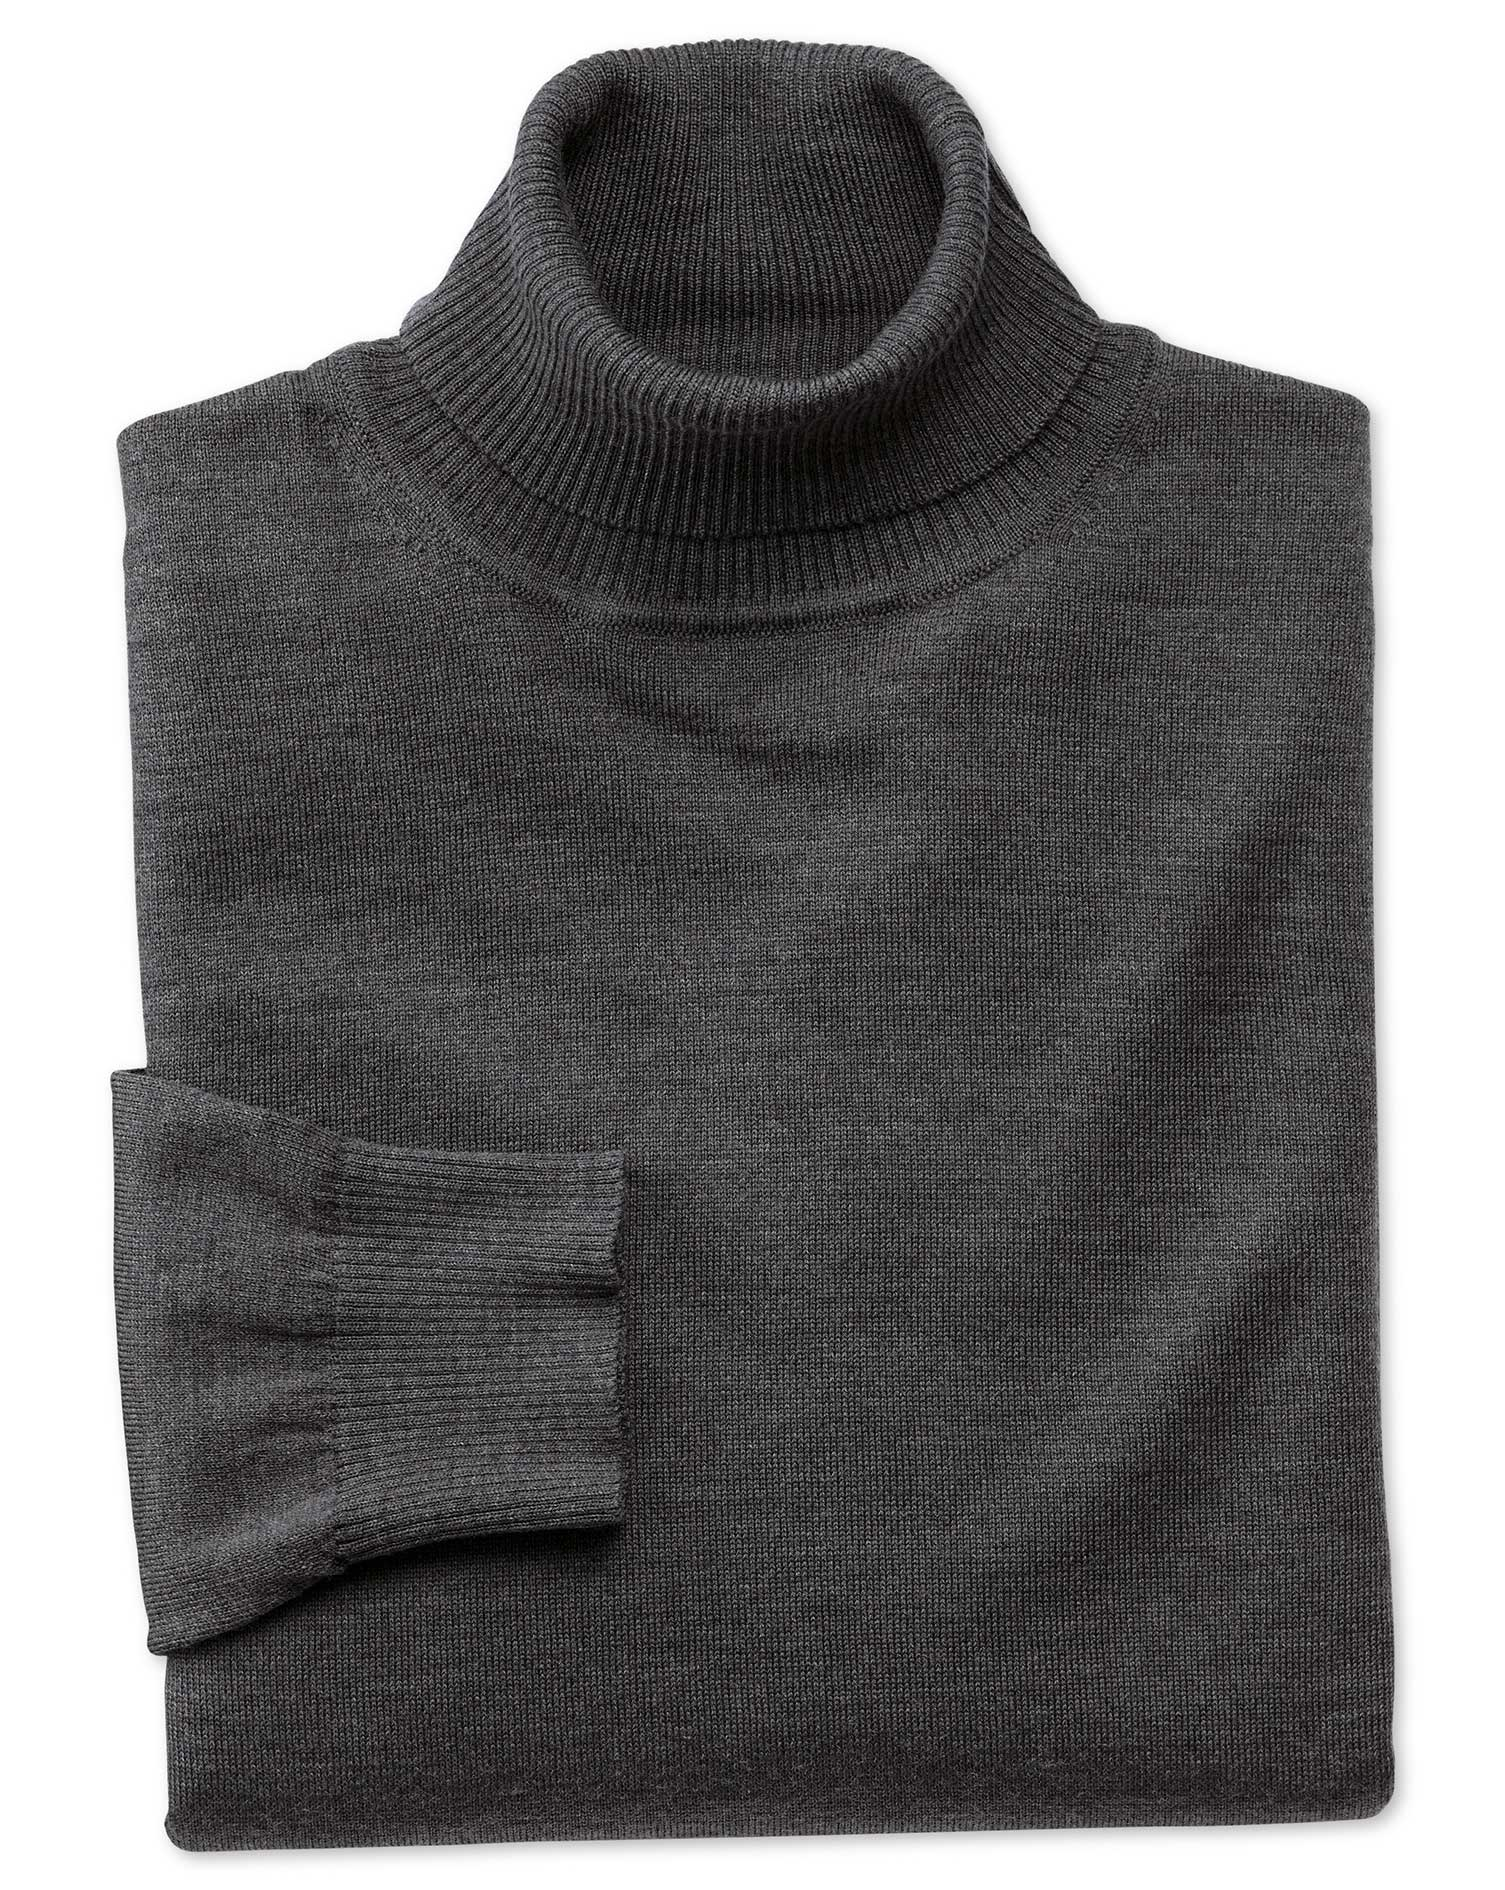 Charcoal Merino Wool Roll Neck Jumper Size XL by Charles Tyrwhitt